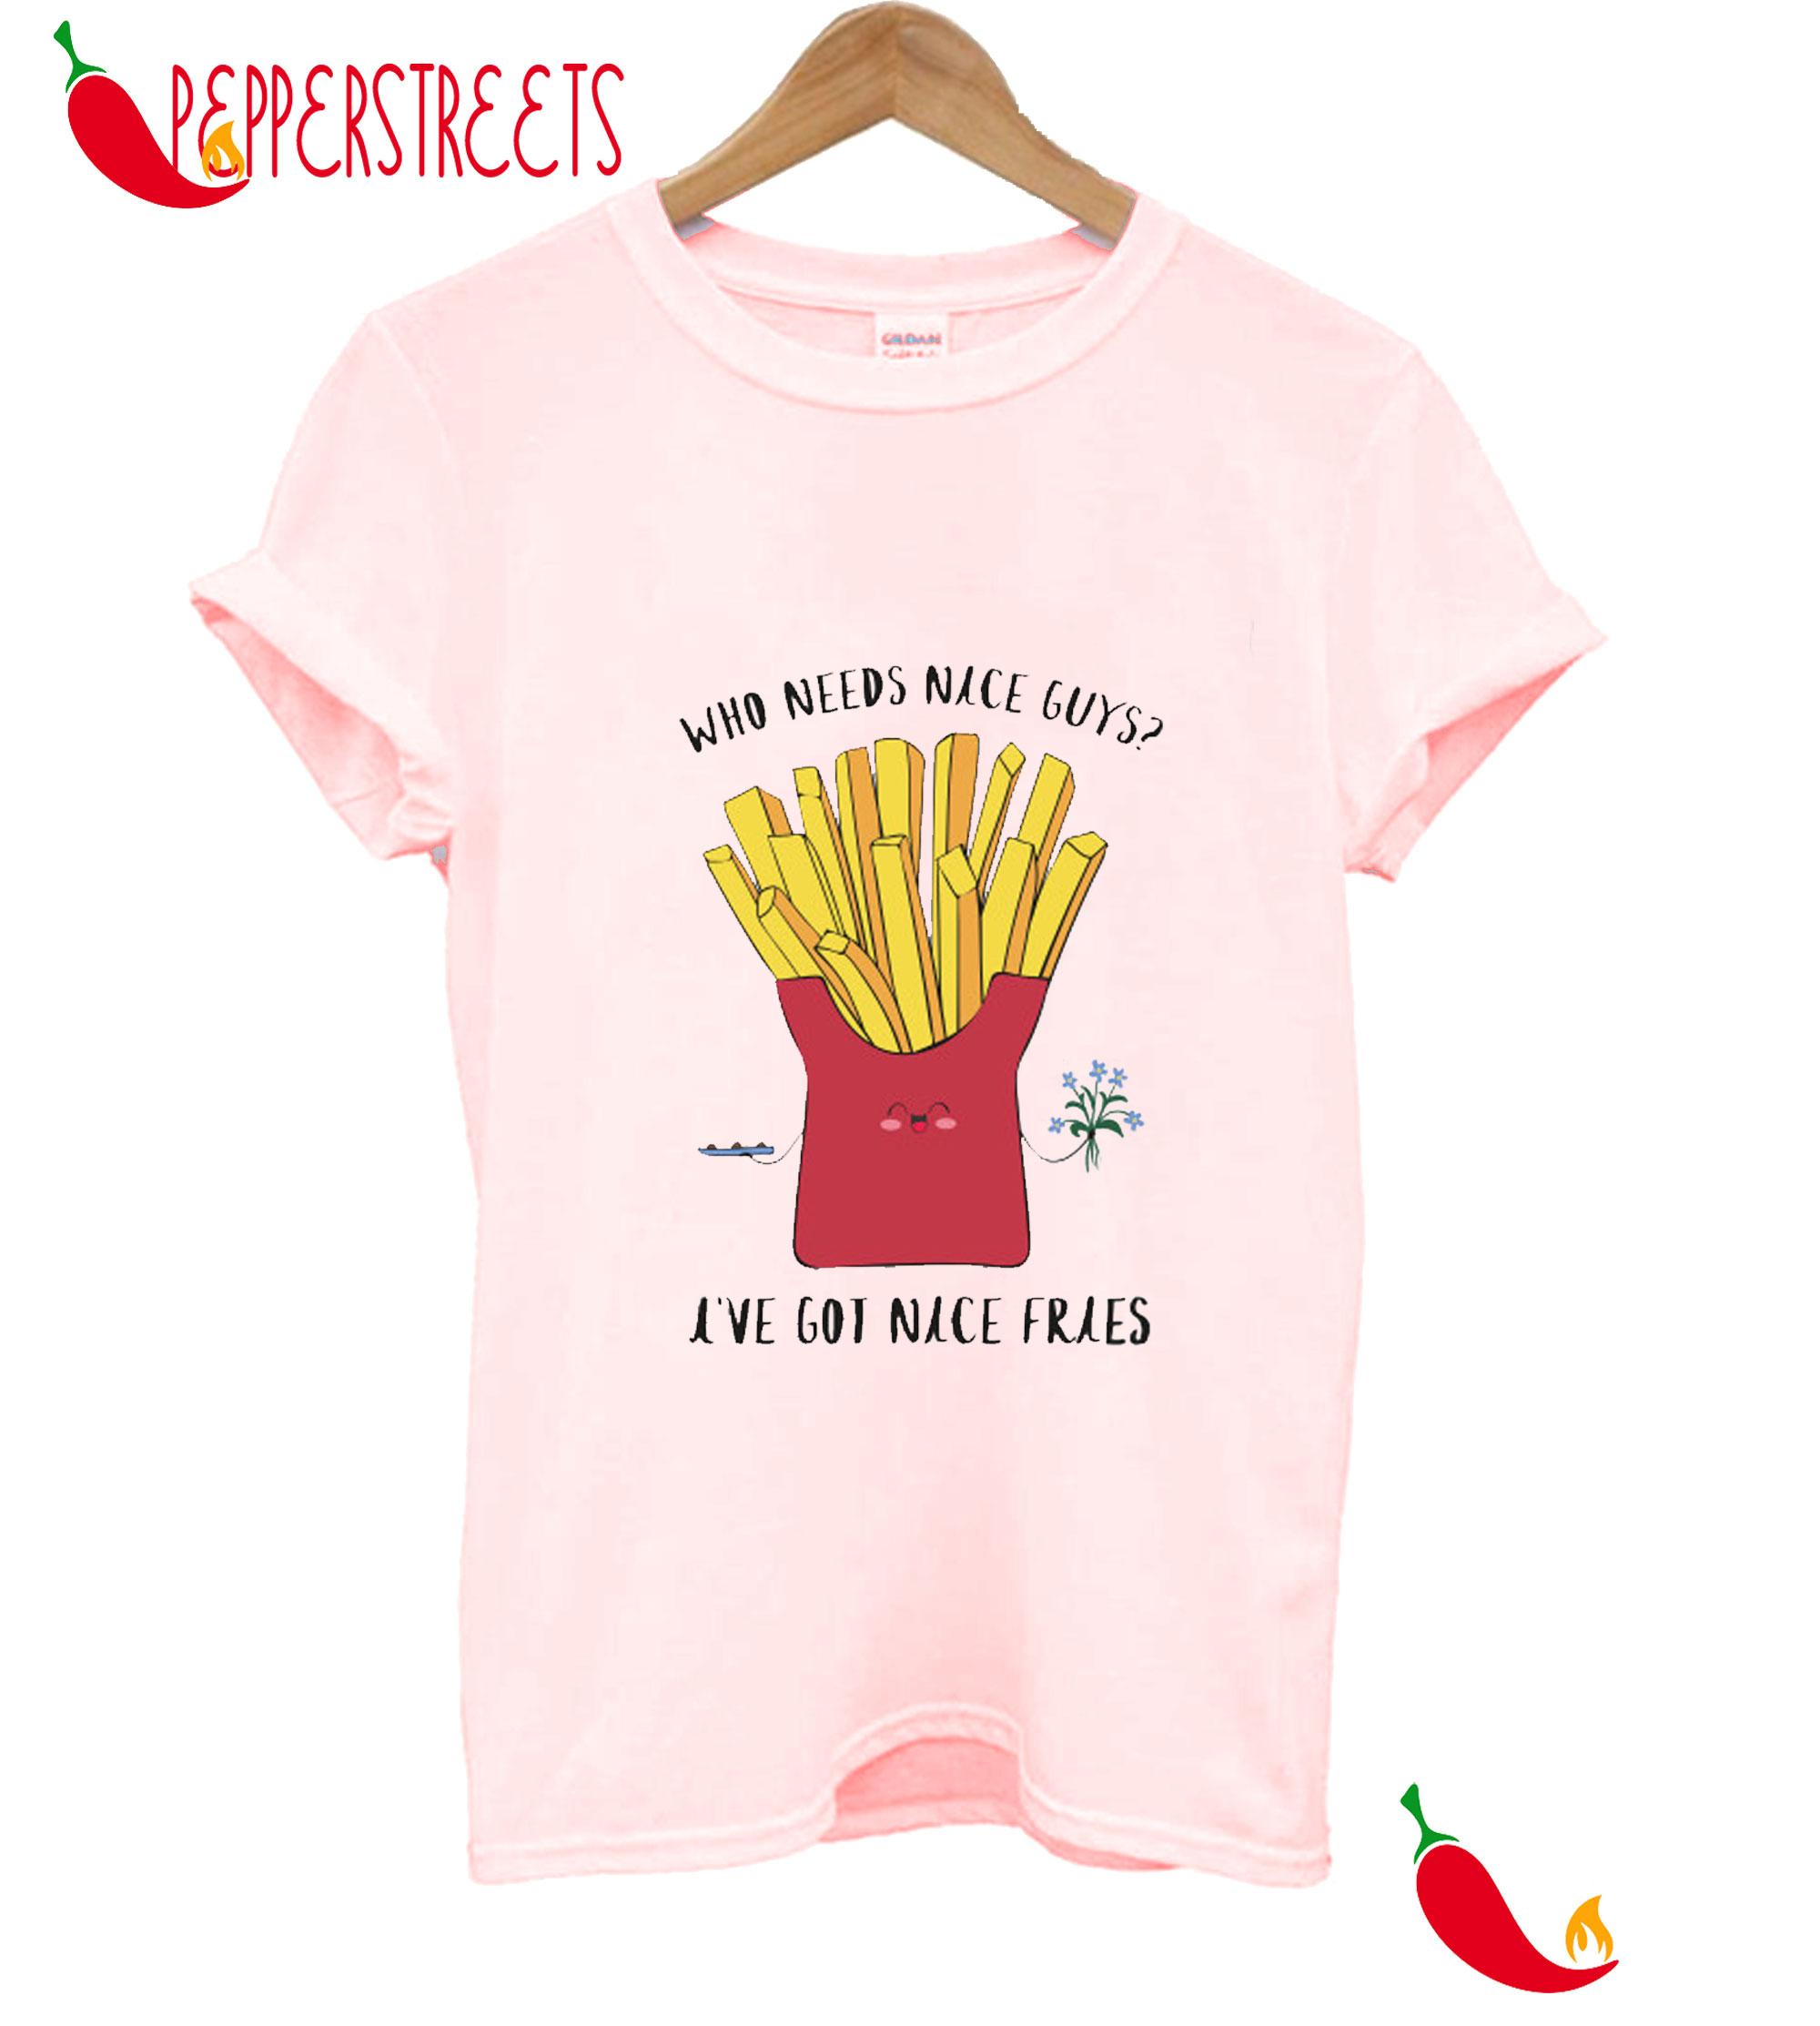 Who Needs NIce Guys I've Got Nice Fries T-Shirt